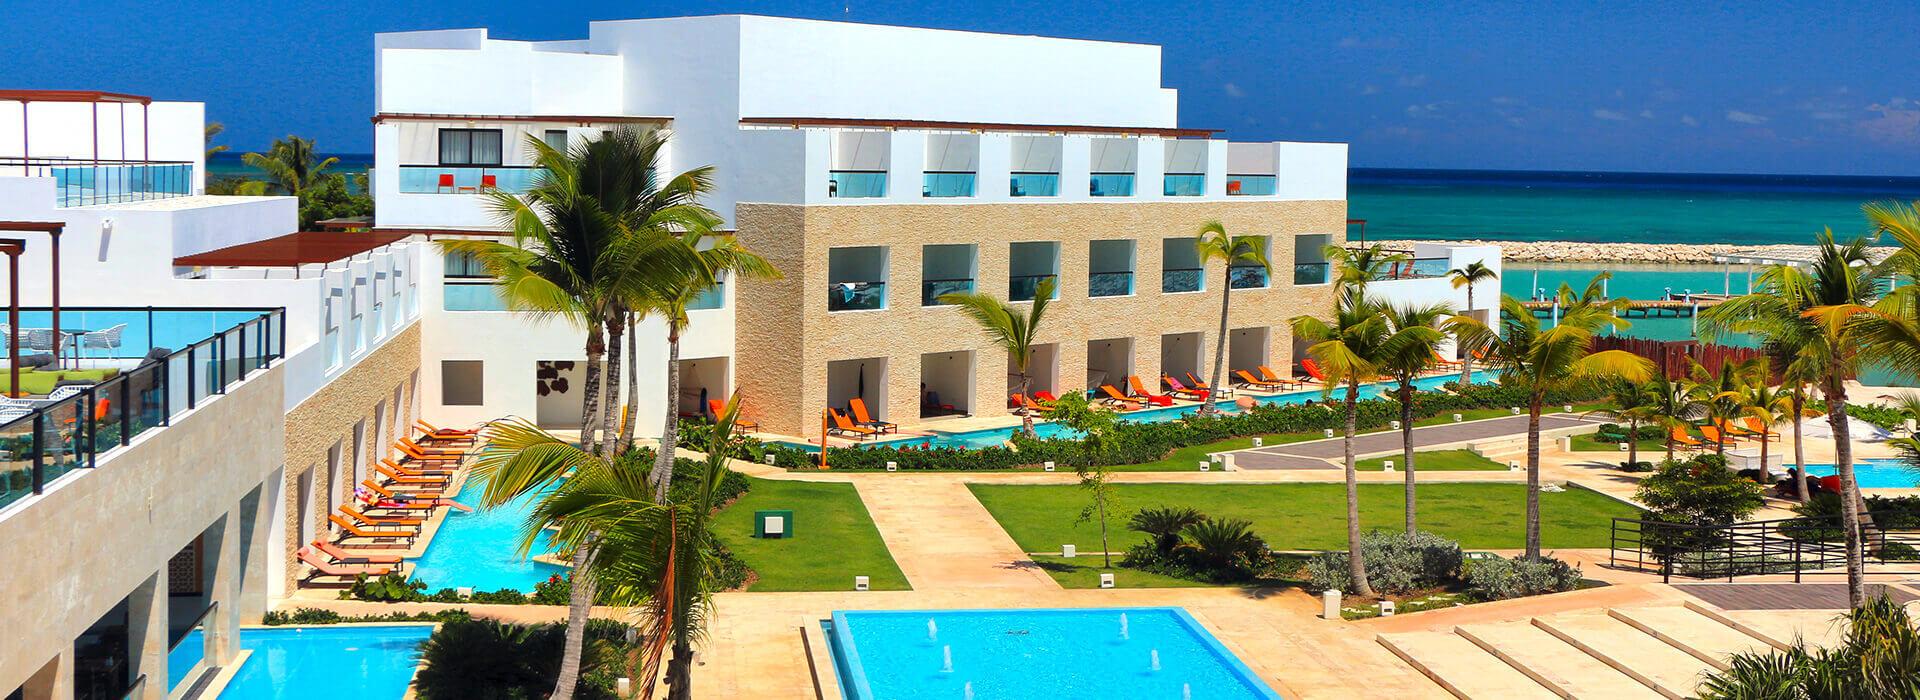 alsol tiara punta cana resort